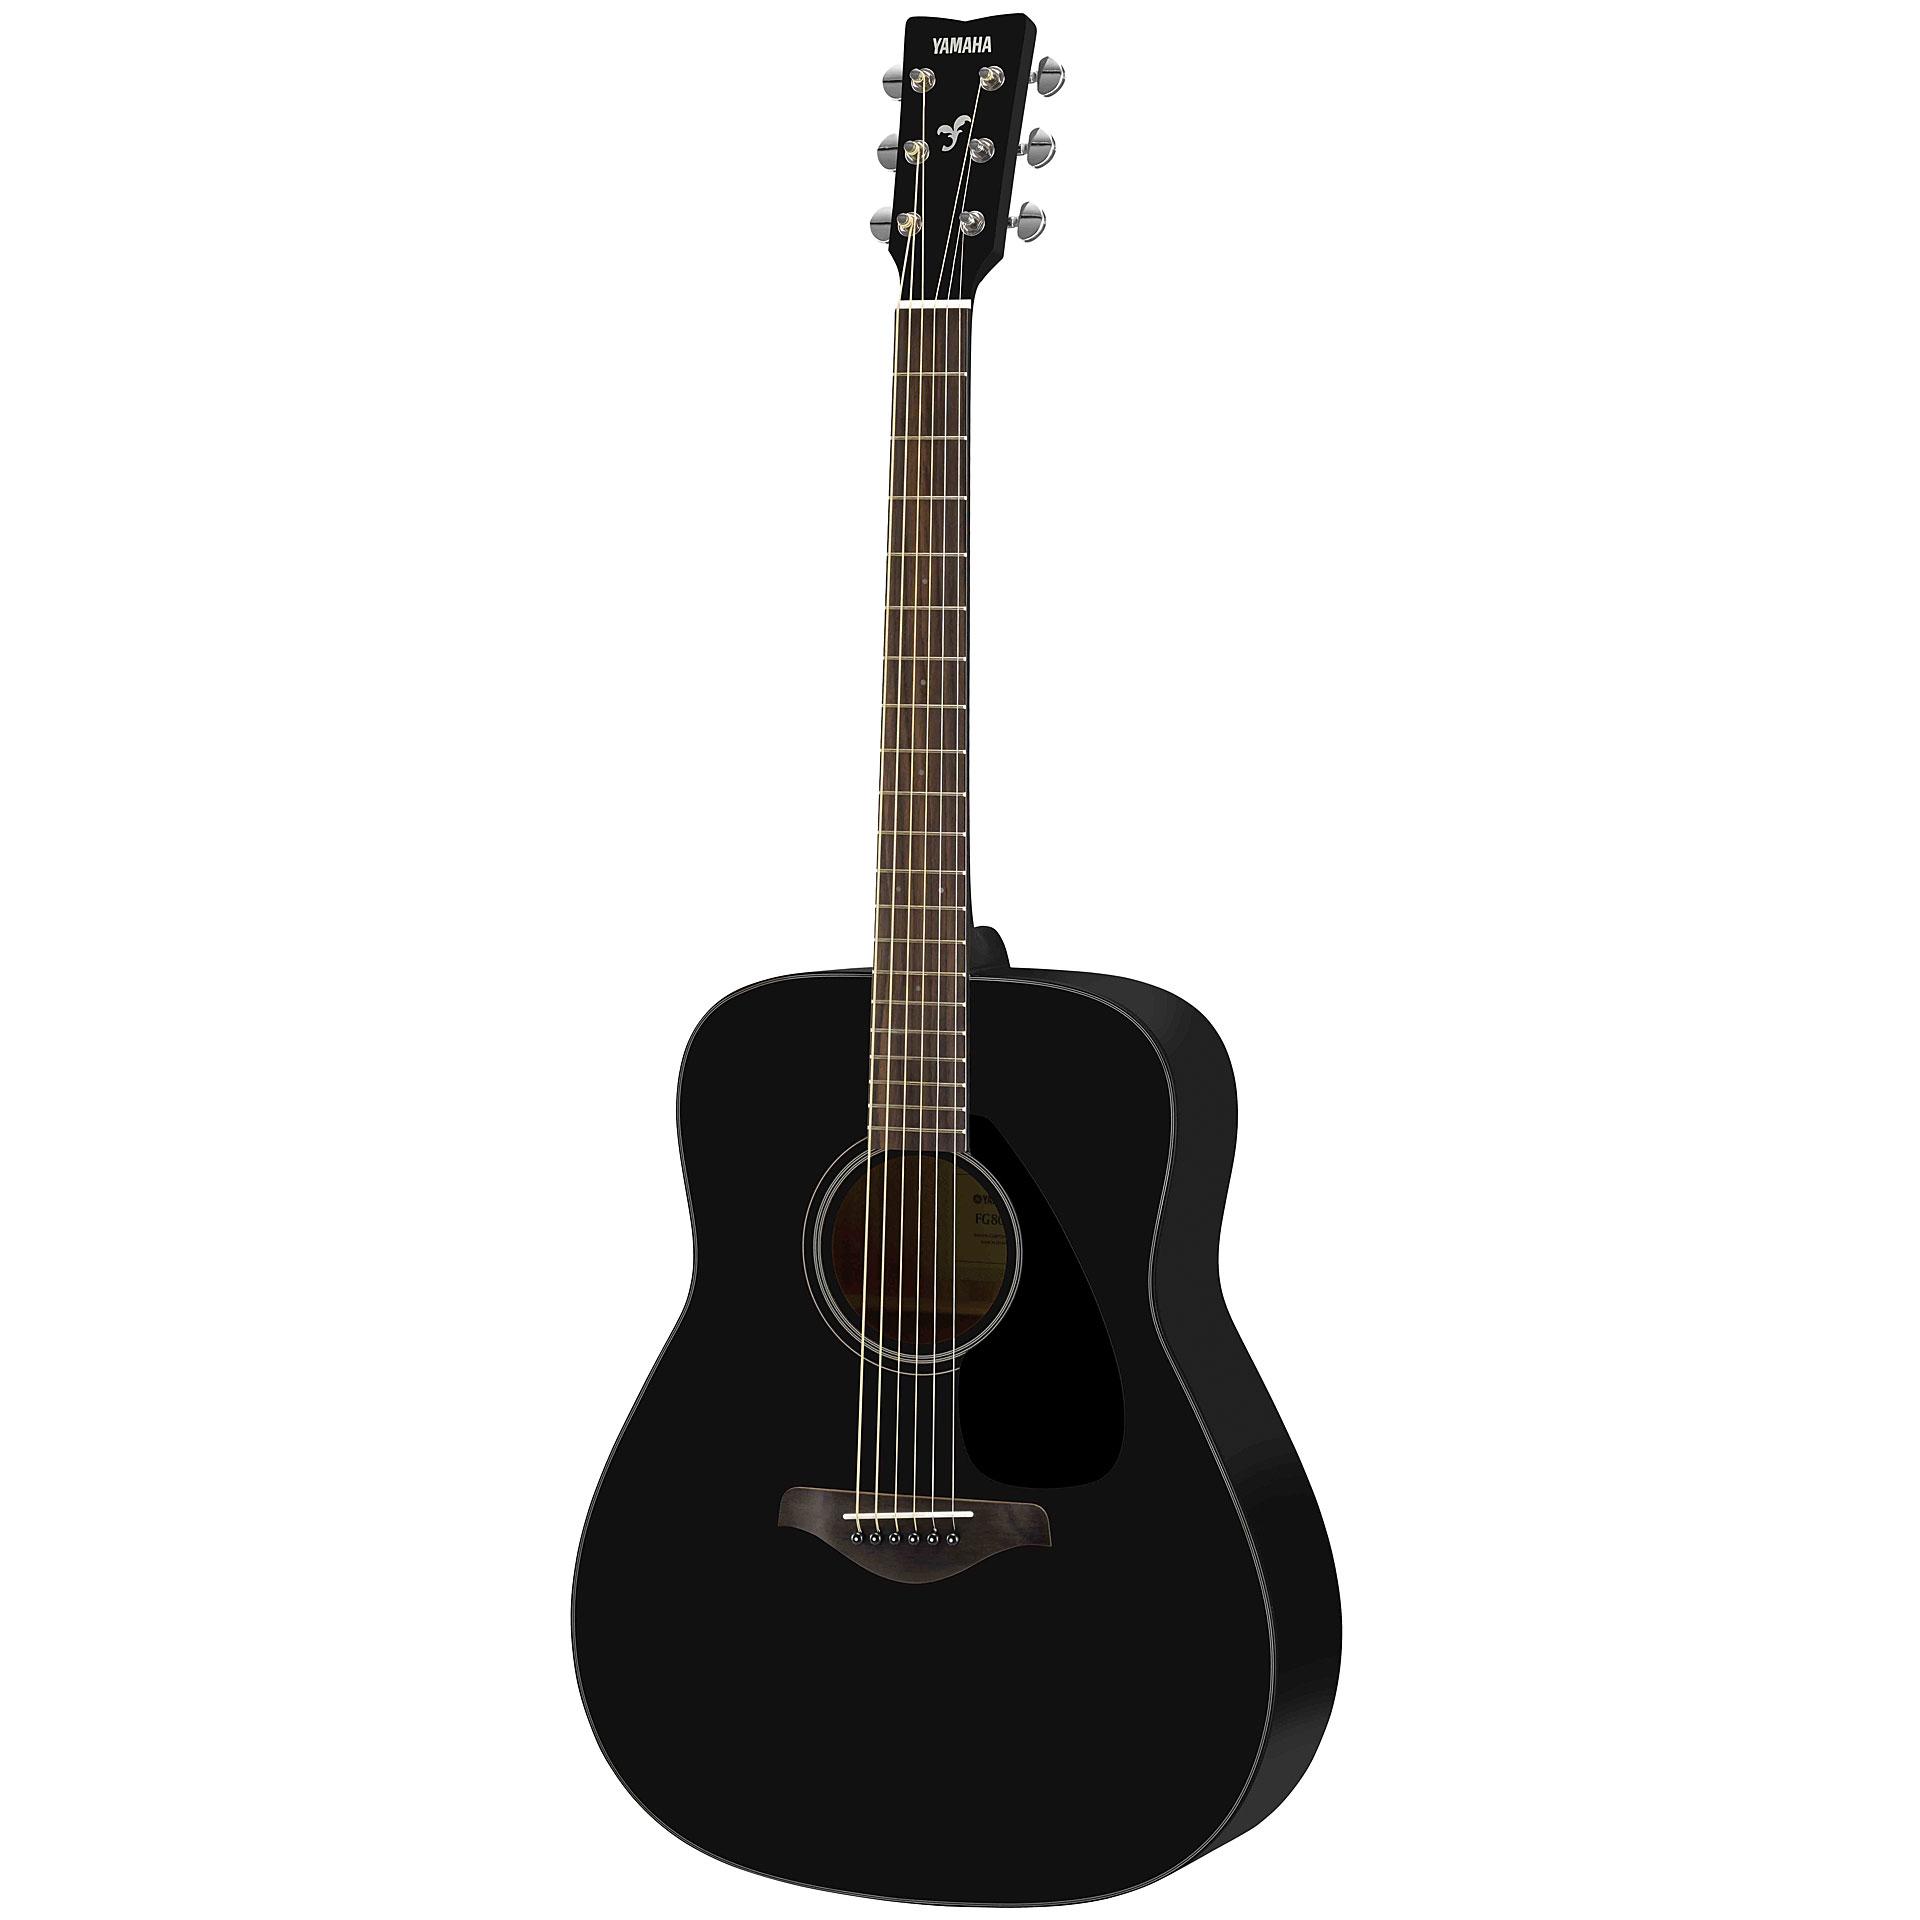 Fgs Yamaha Guitar